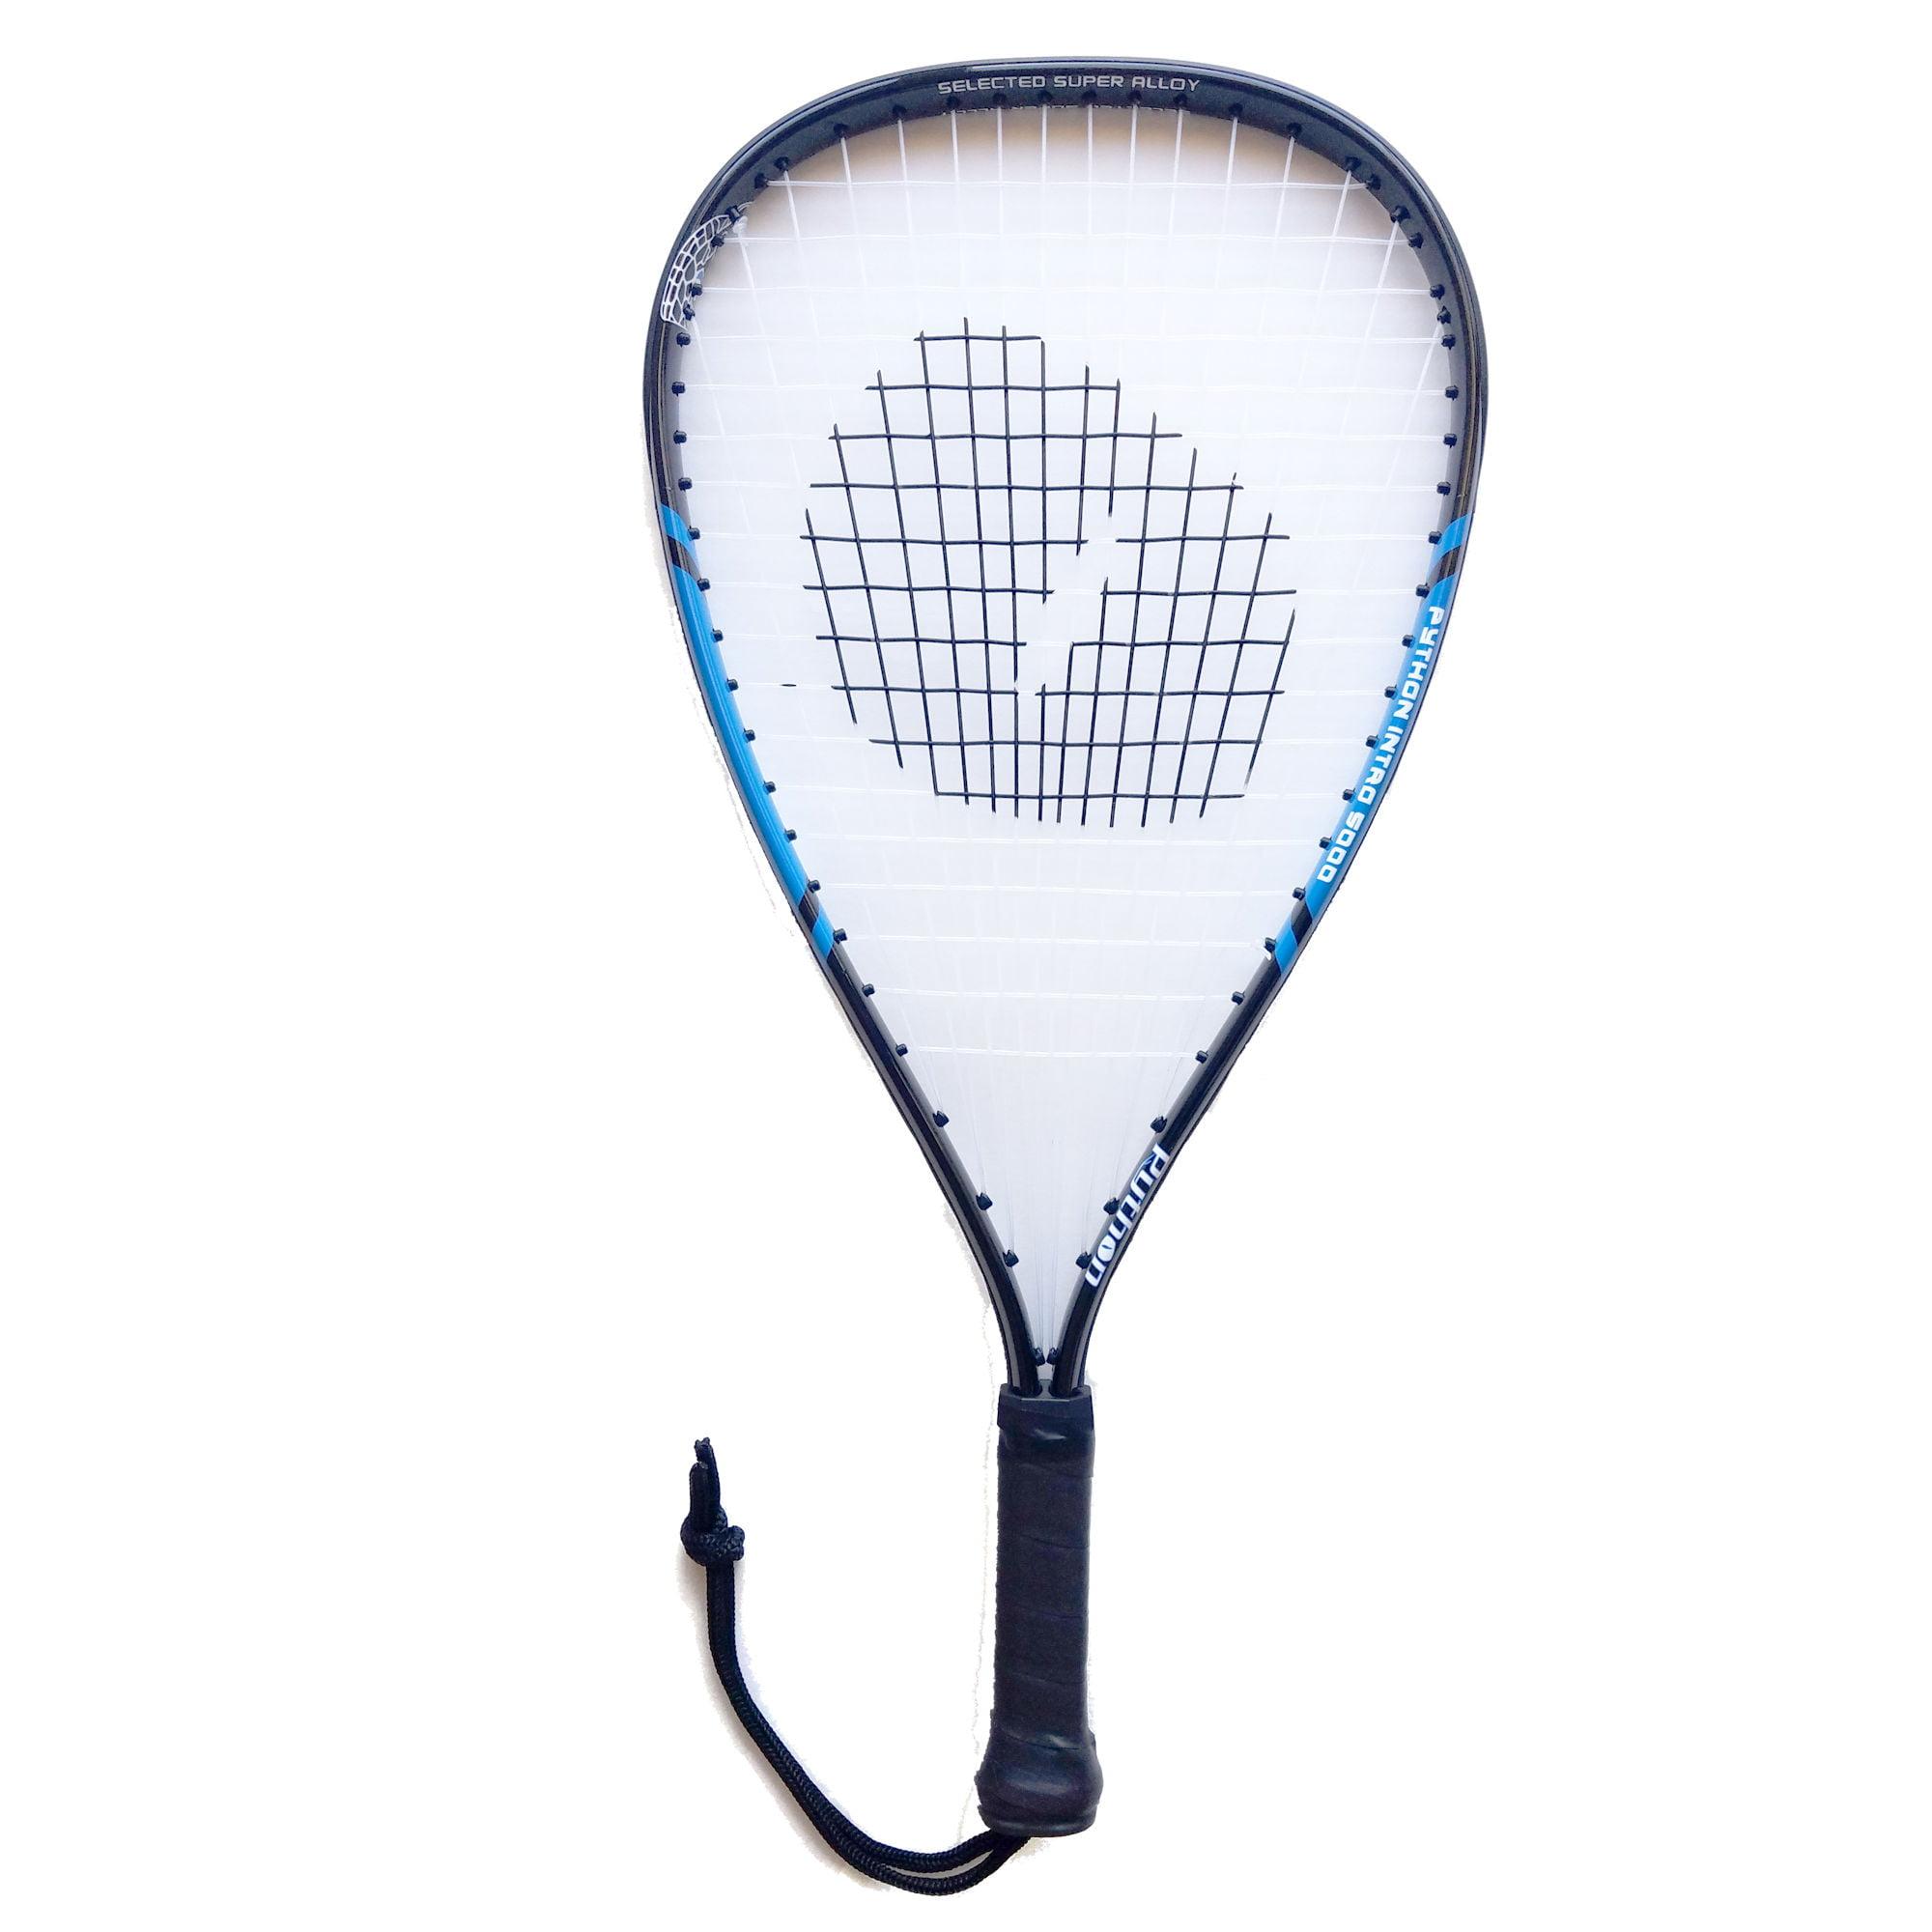 Python Intro 5000 Blue Racquetball Racquet (Beginner Racket) by